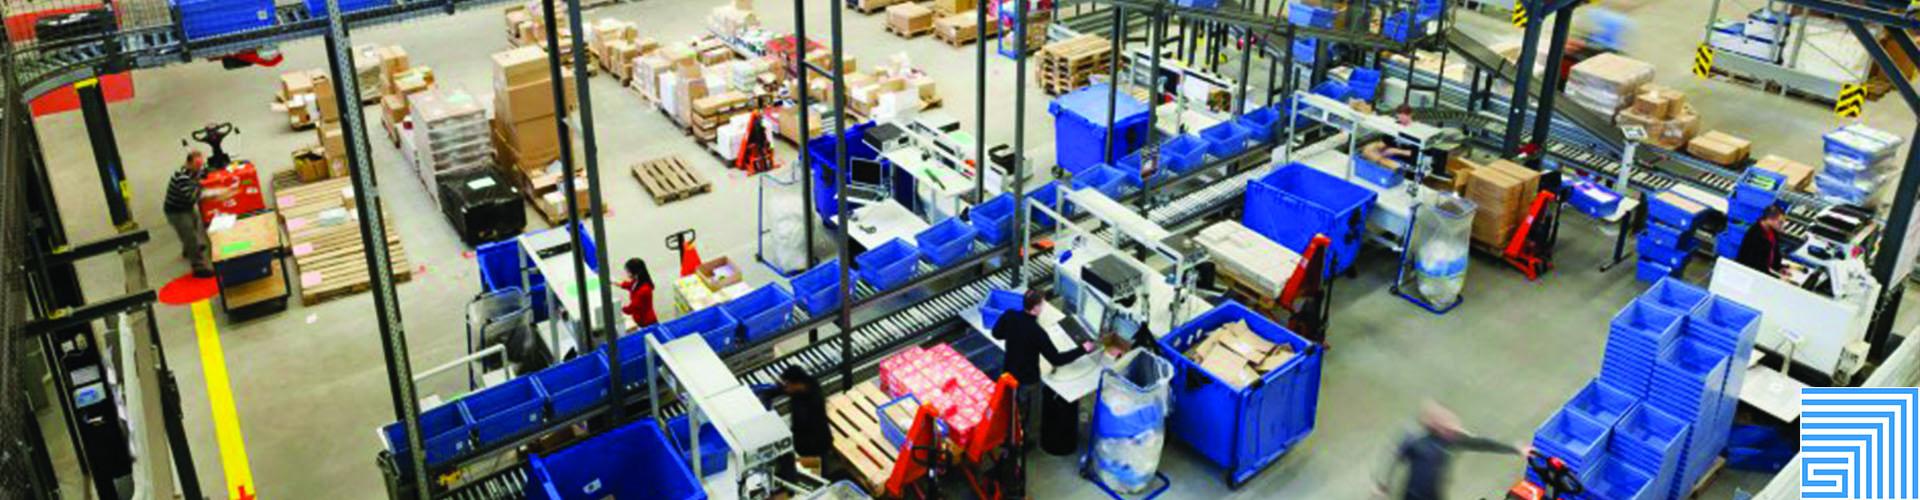 Sovella Nederland Treston concept inpaktafel voor logistieke centra en fulfilment